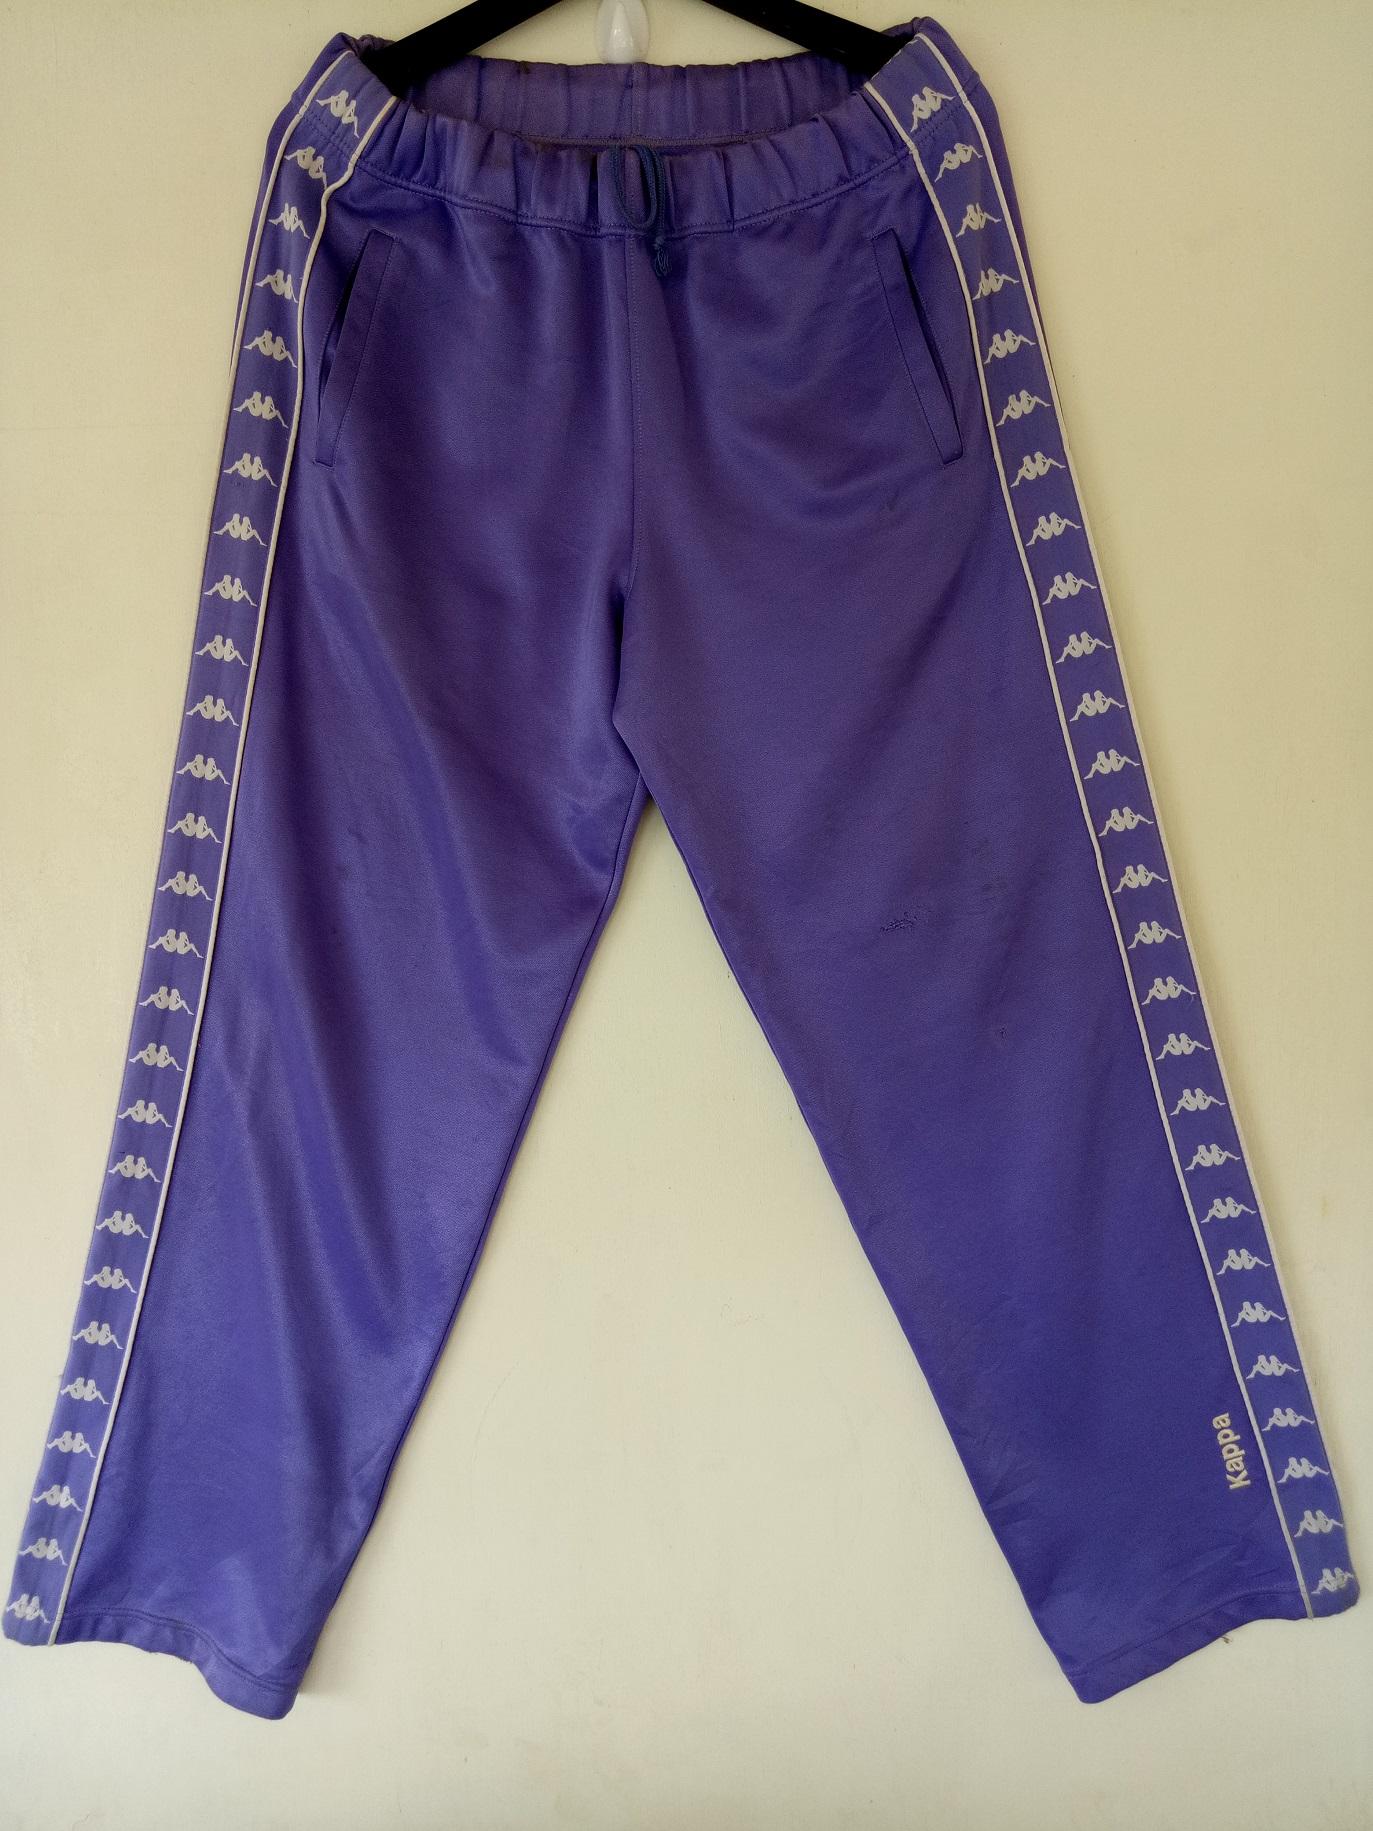 e3291f95 VINTAGE KAPPA sweatpants sports track rare design spell out original  streetwear jogging athletic tracksuit purple pants